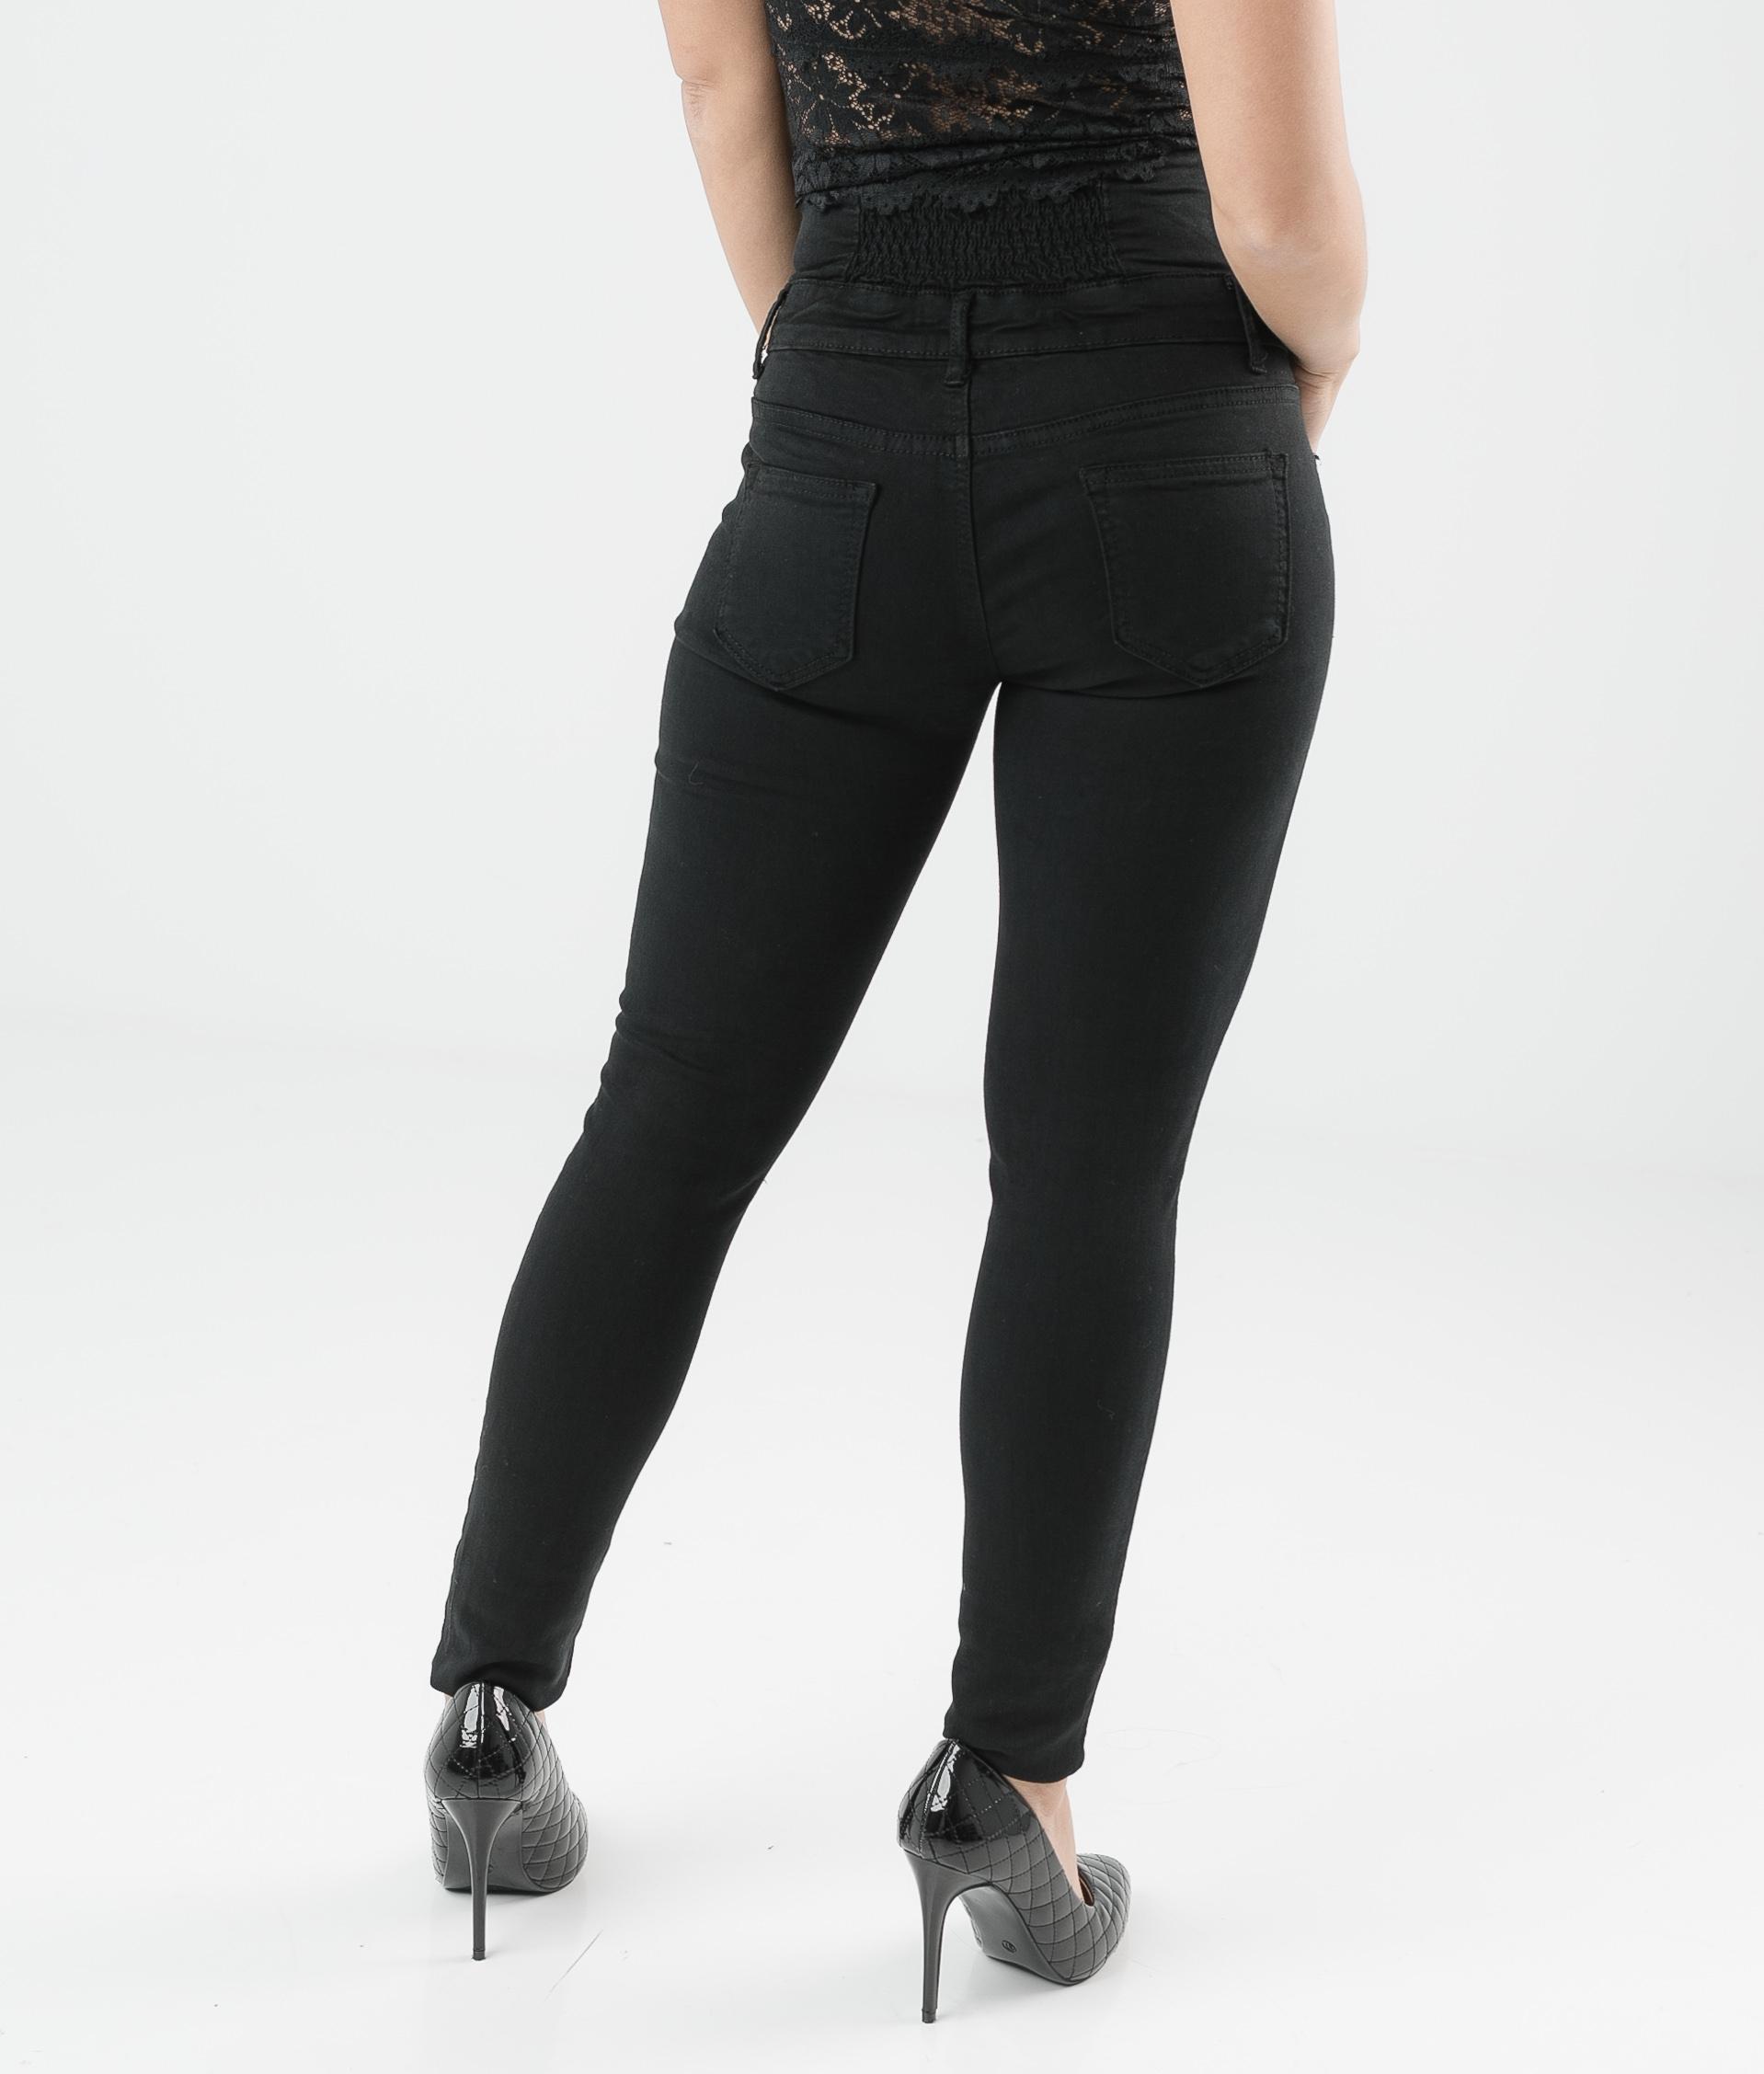 Pantalón CHERYL - Negro